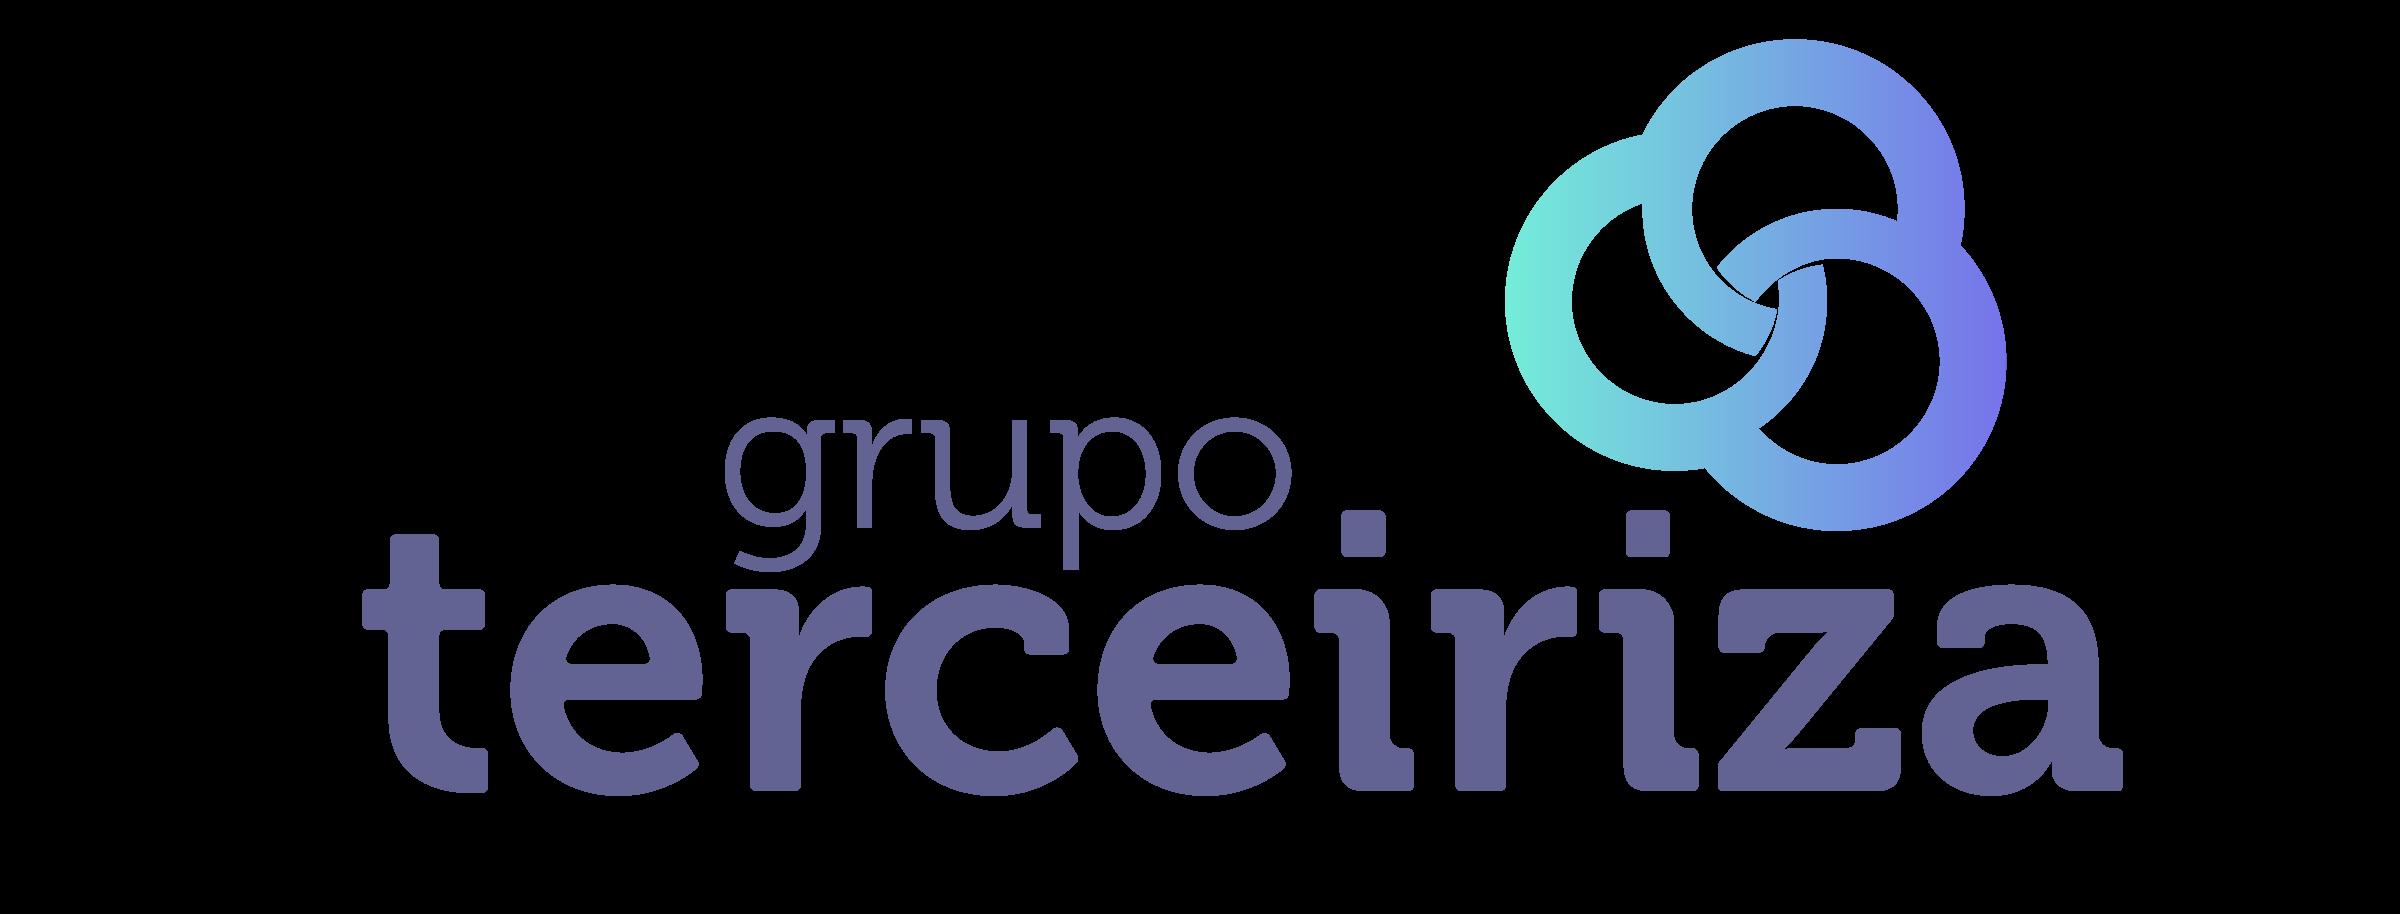 Grupo Terceiriza